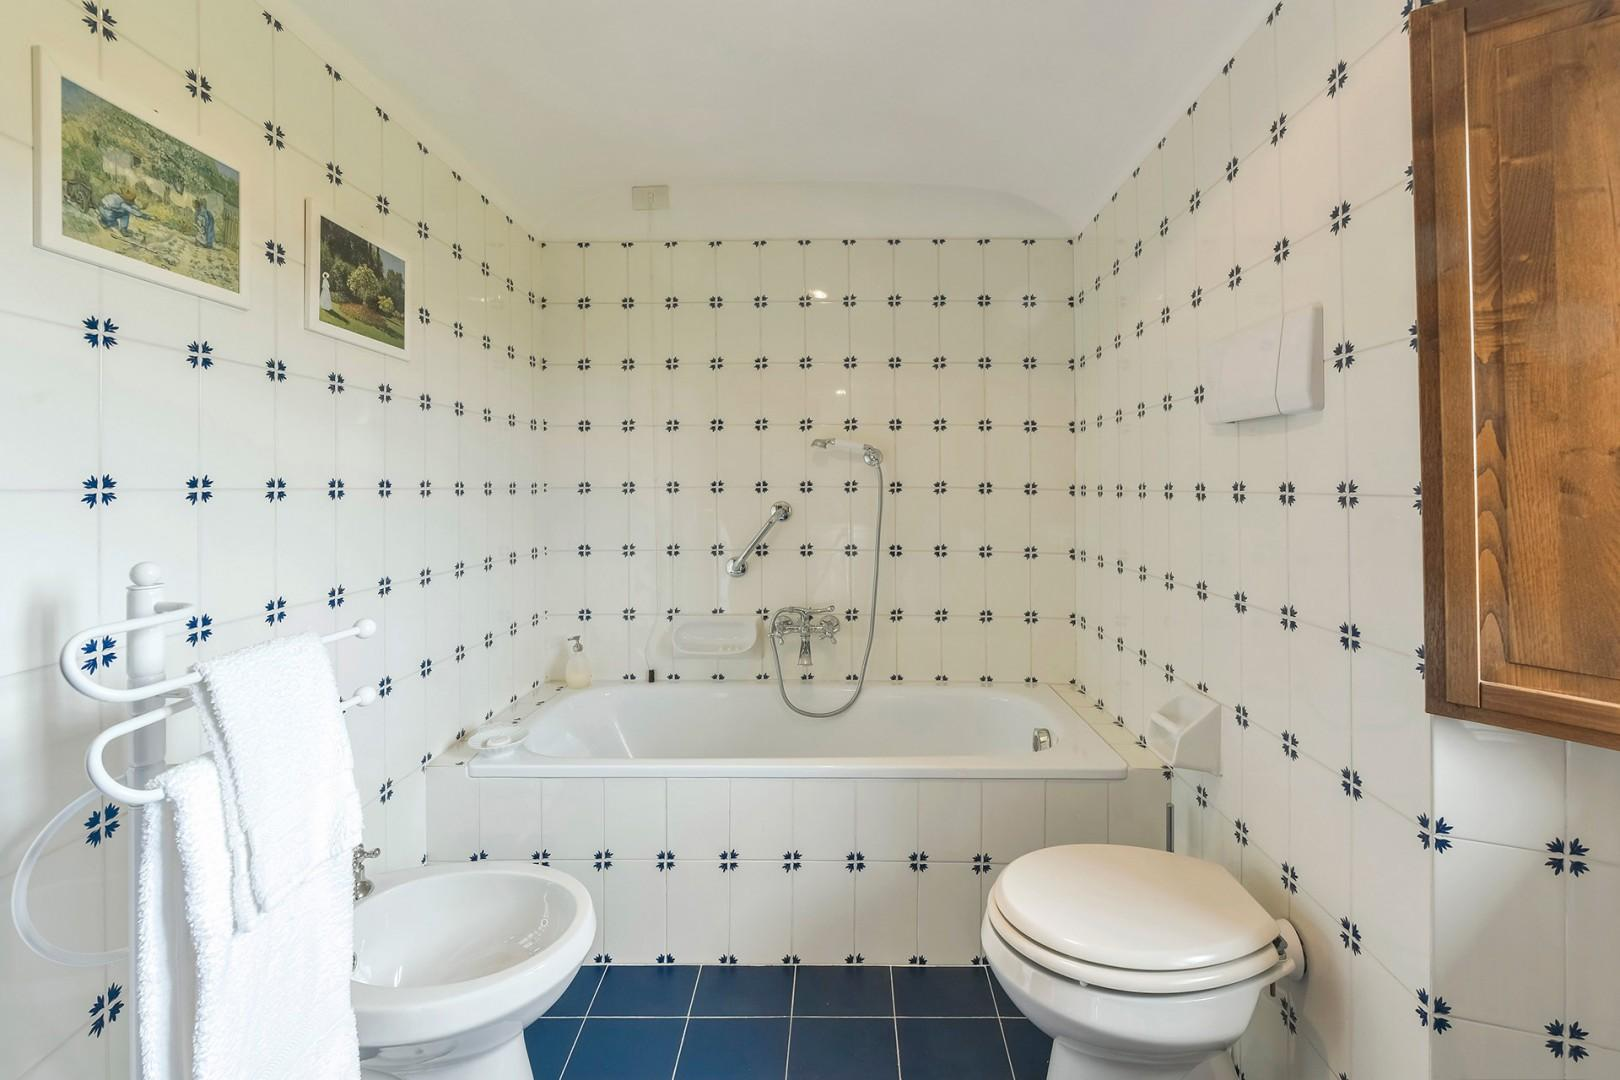 Bathroom 3 has a tub with handheld showerhead.